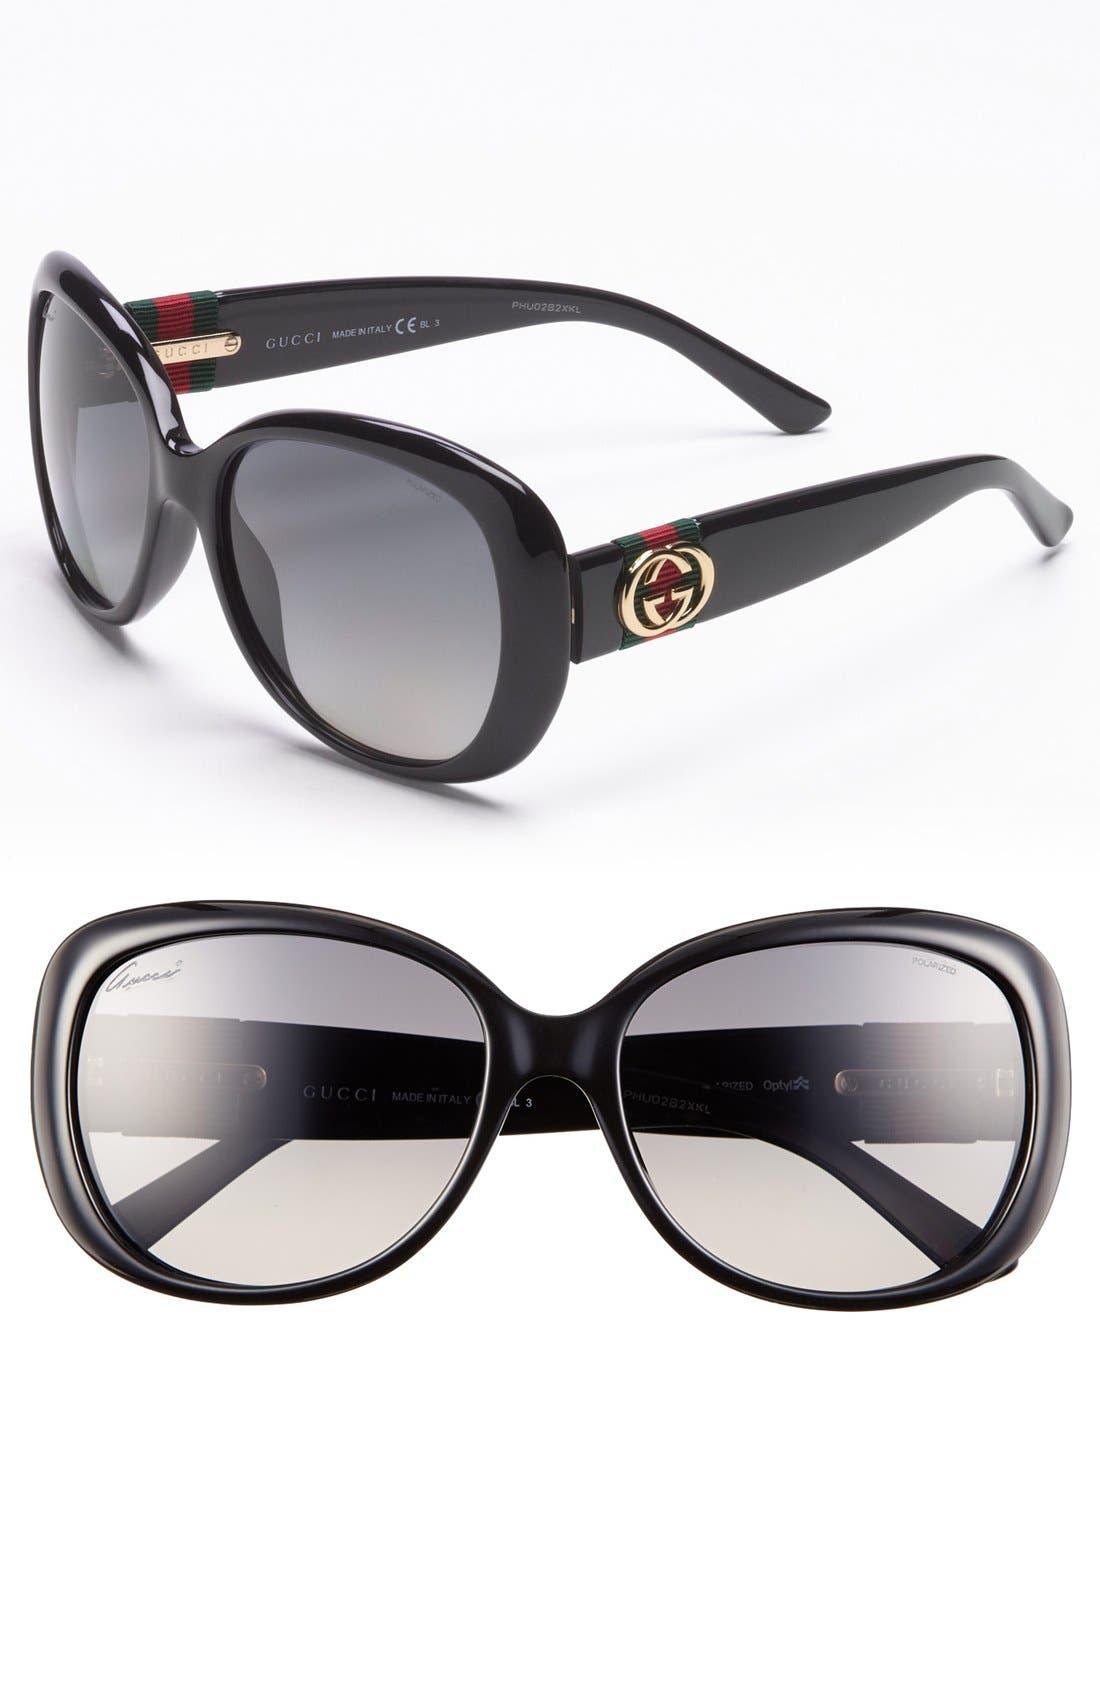 Main Image - Gucci 56mm Polarized Sunglasses